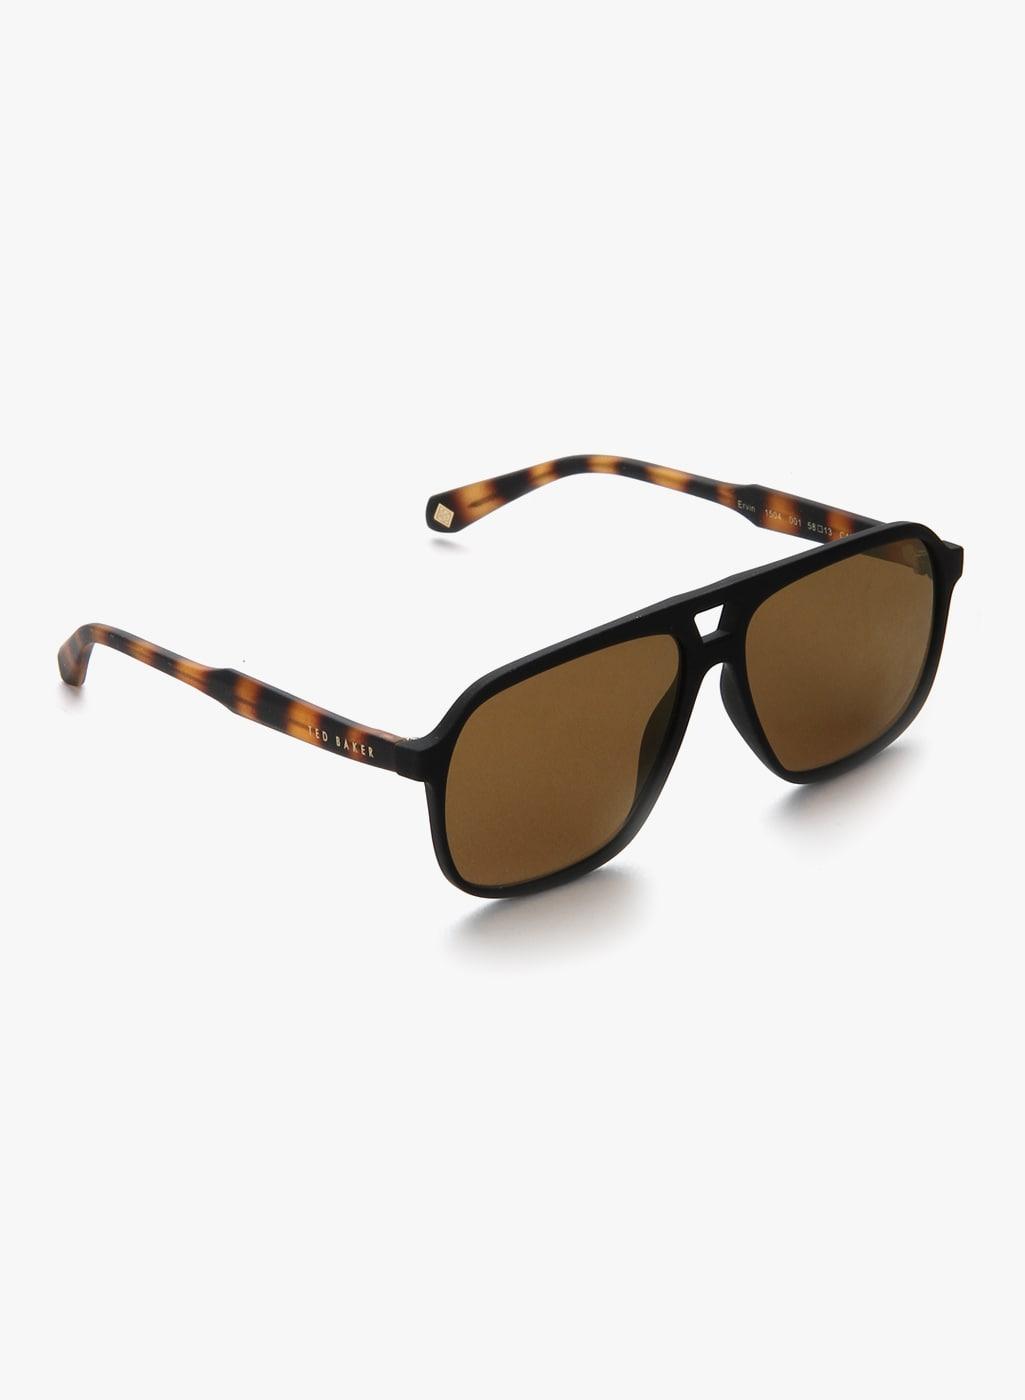 49645053c4 Sunglasses For Men - Buy Mens Sunglasses Online in India